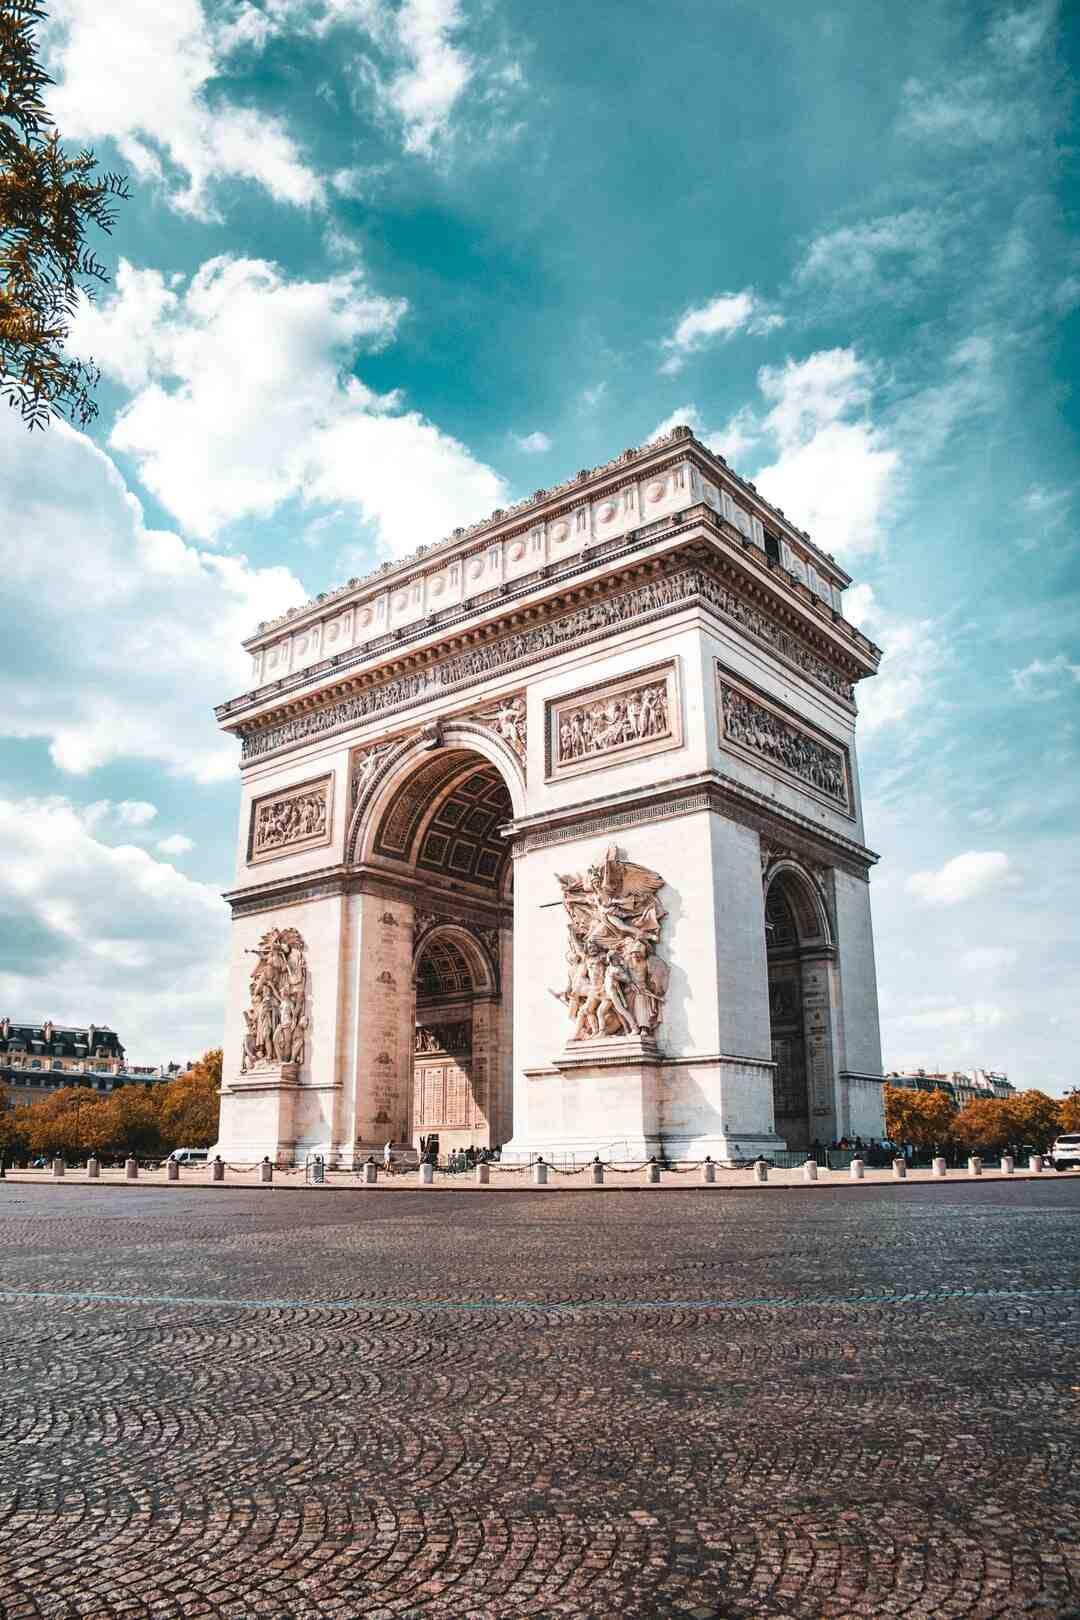 Où aller se reposer en France ?